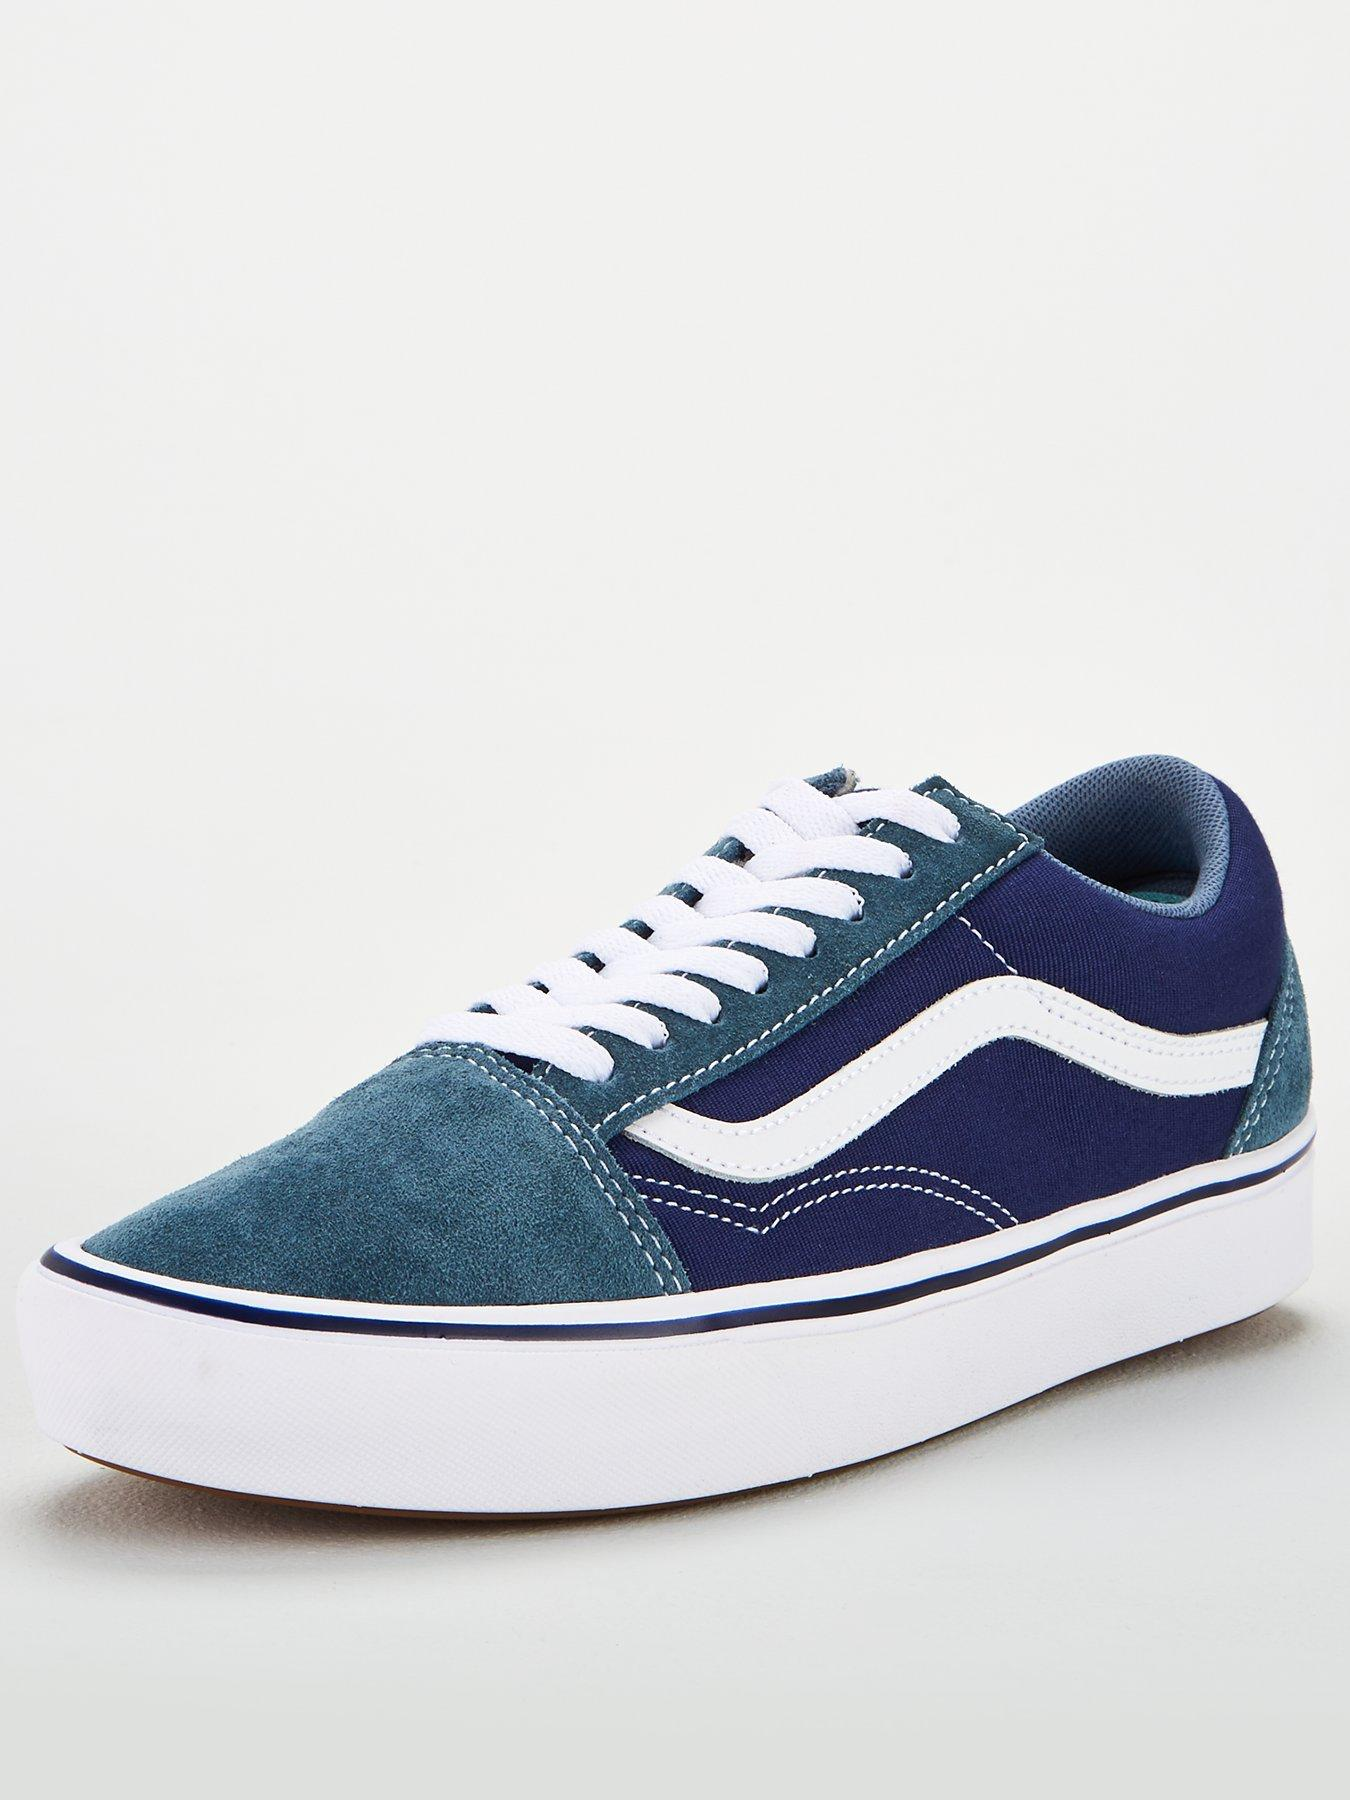 Vans OLD SKOOL CANVAS SKATE Shoes Size Men's 7.5 $65 DRESS BLUES KHAKI